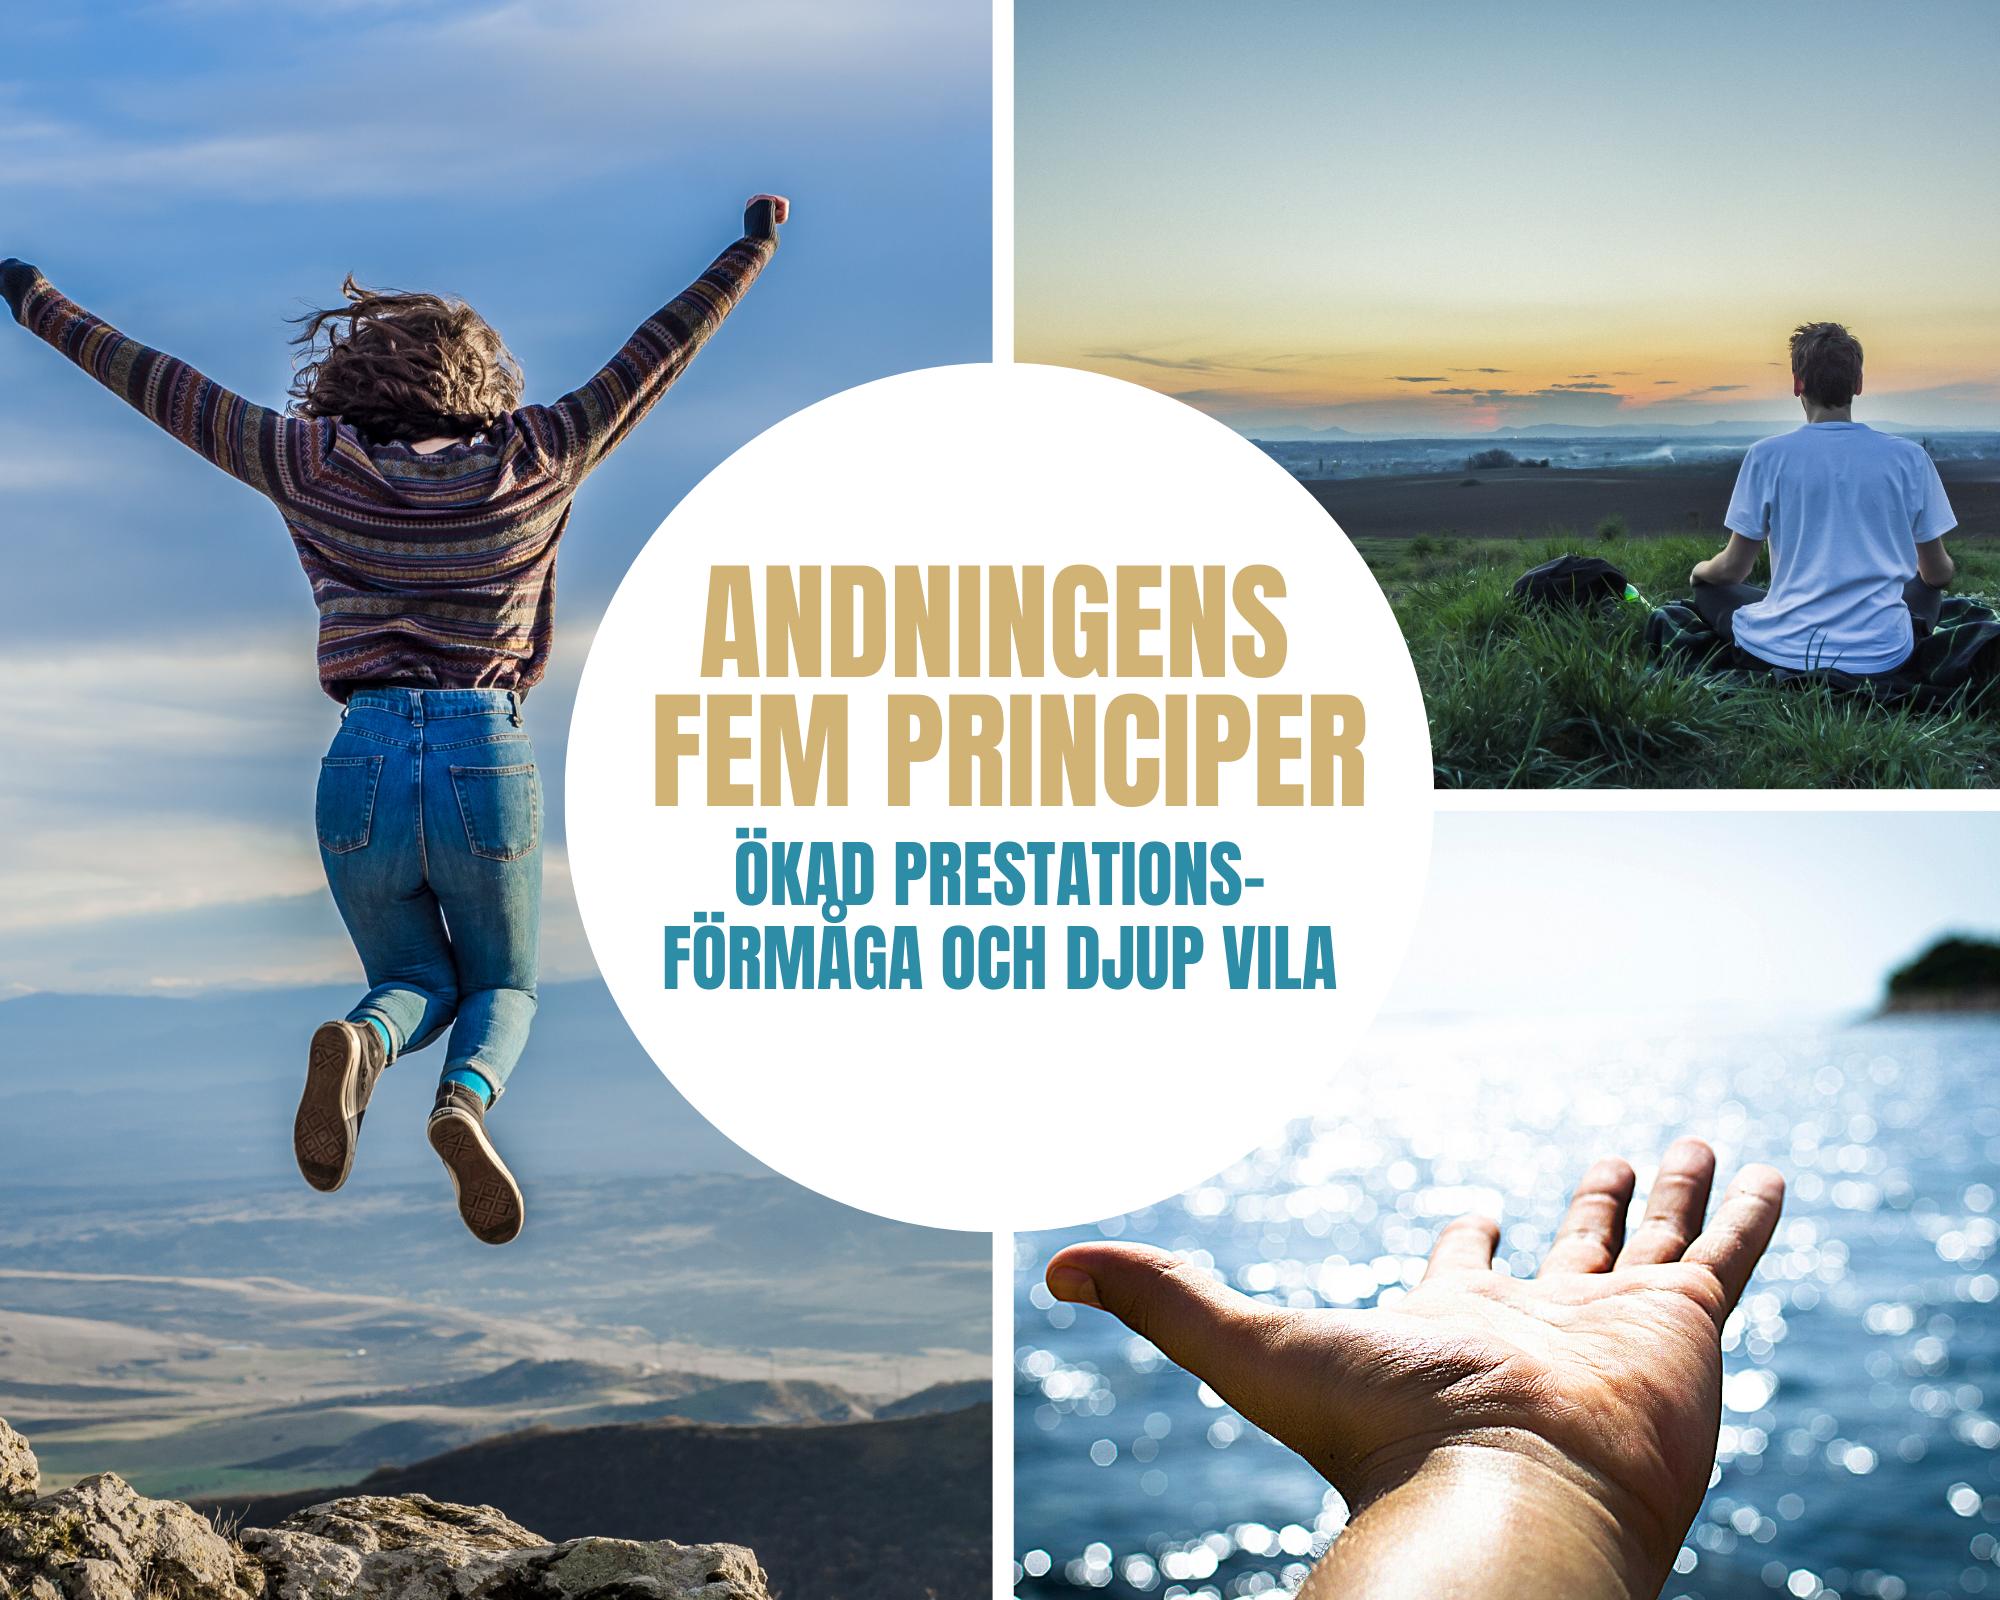 Andningens fem principer - Workshop!